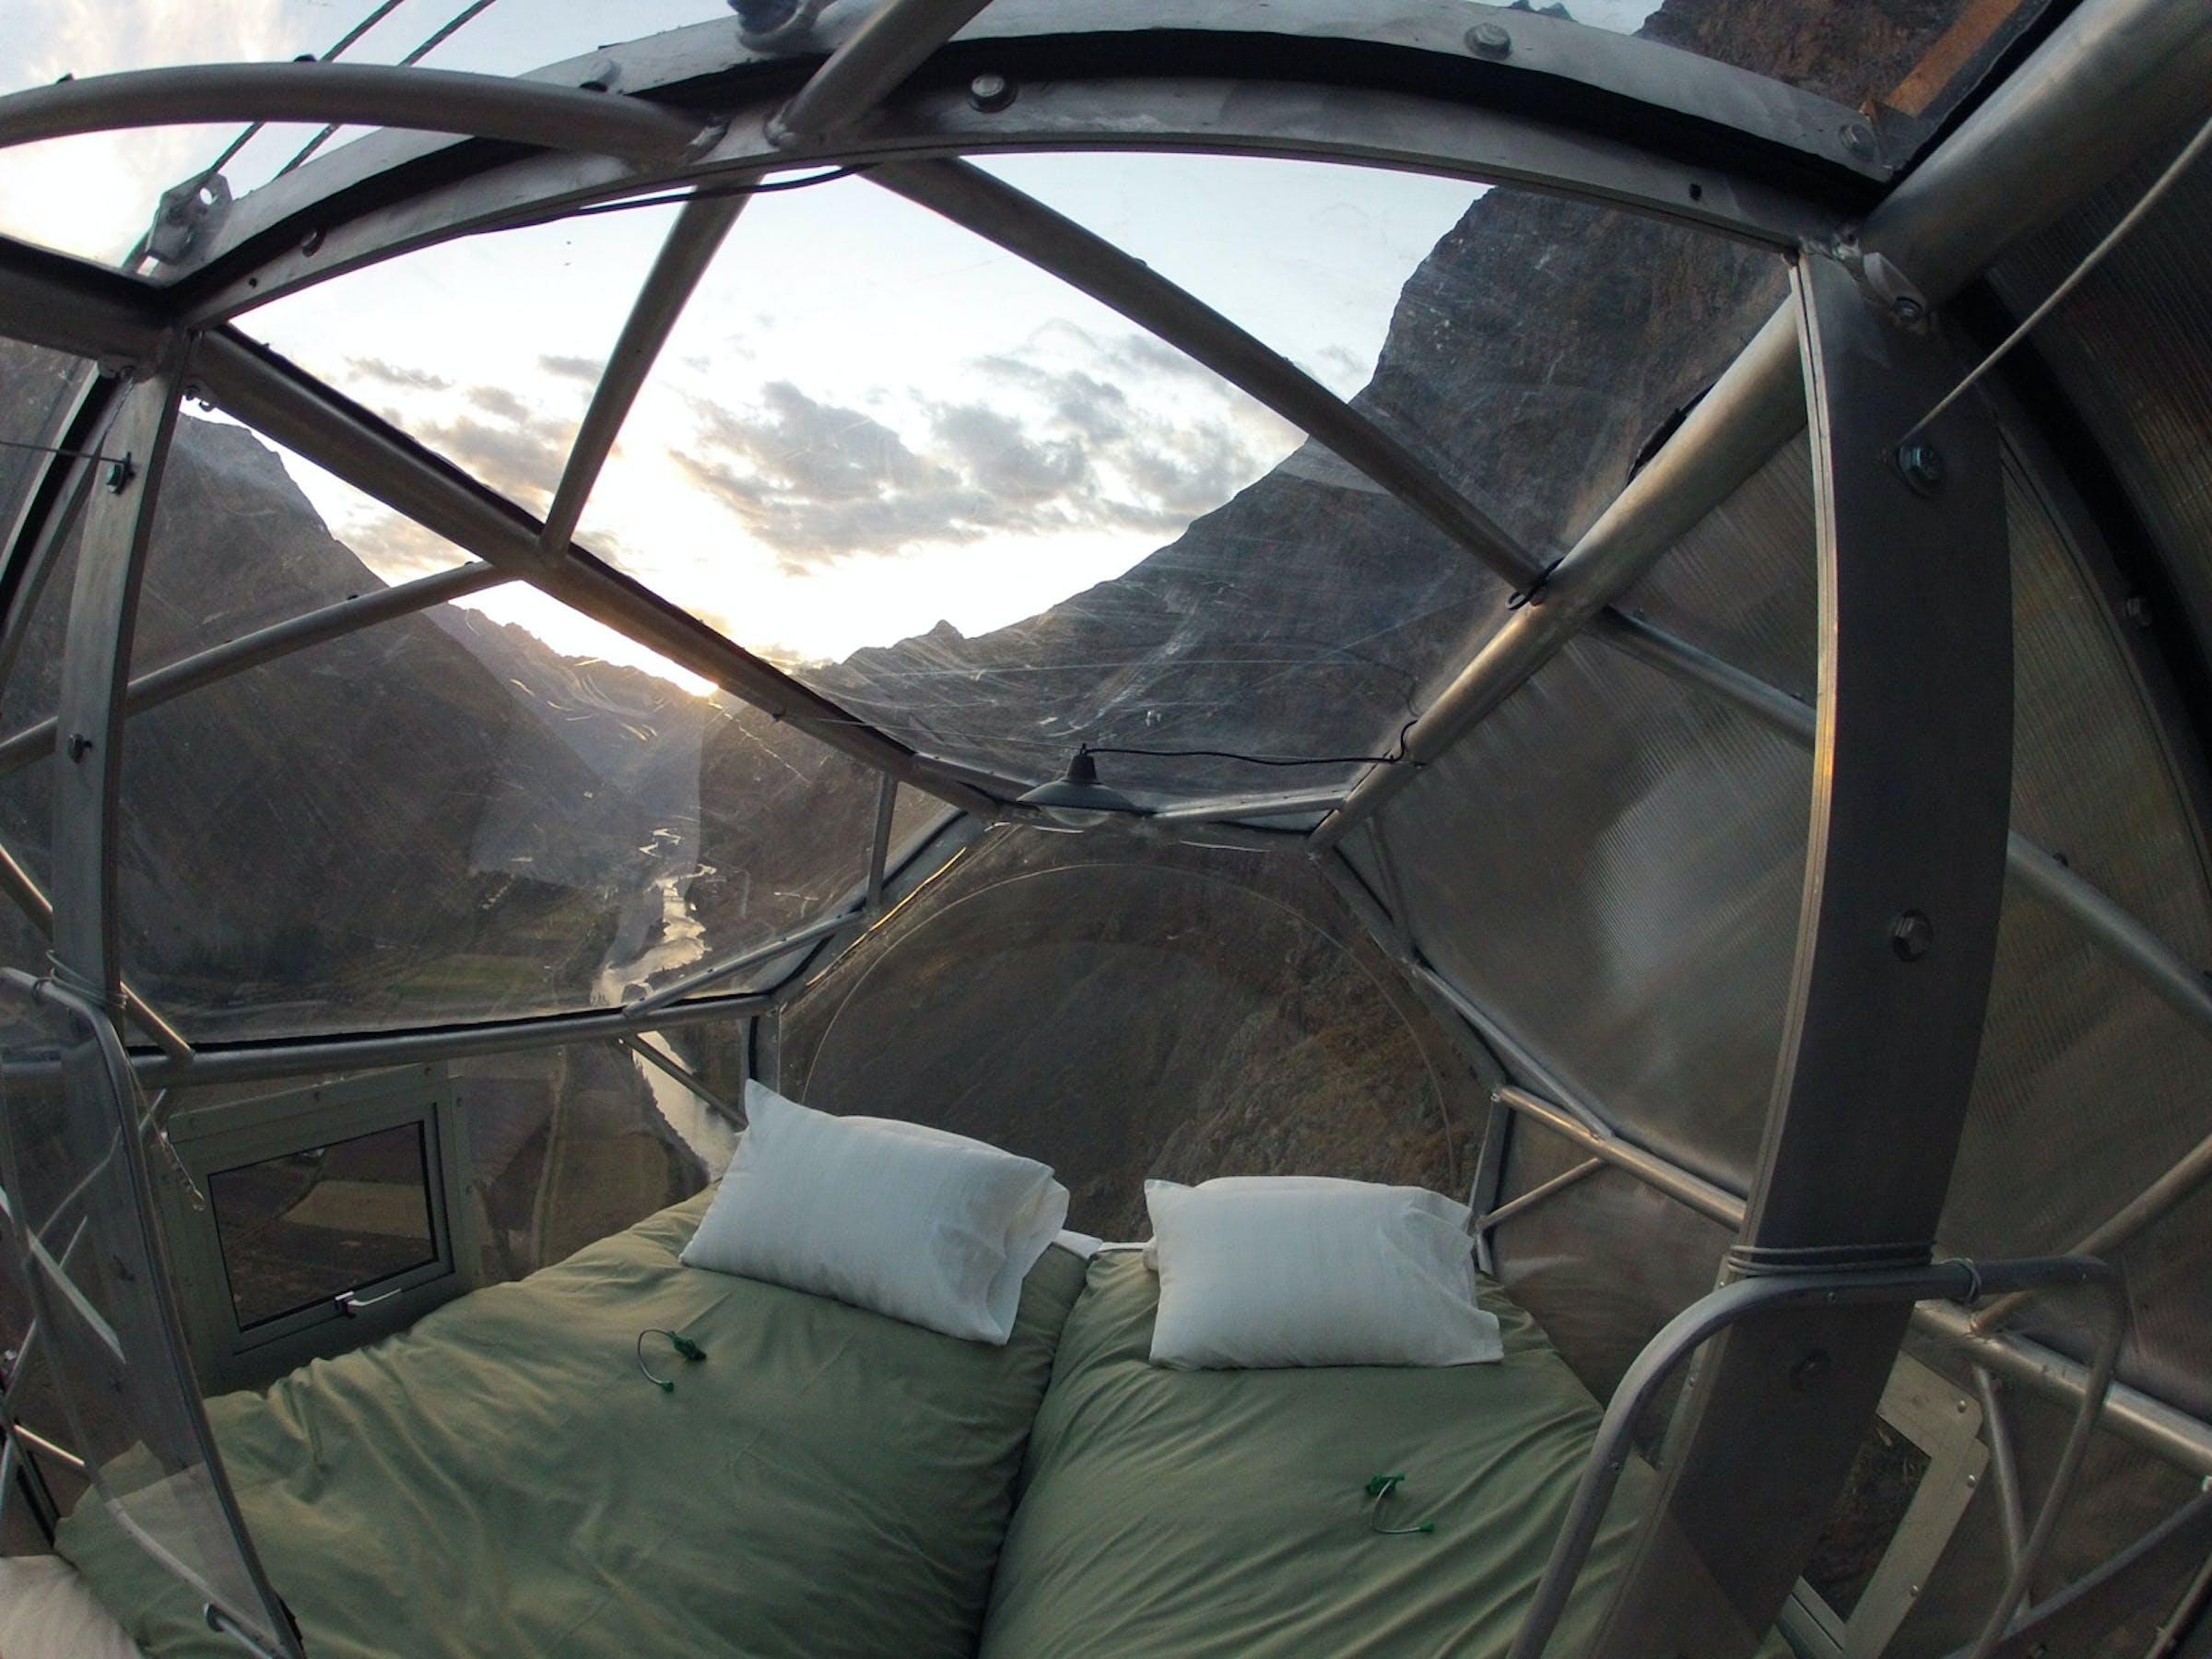 Hotel, mountain